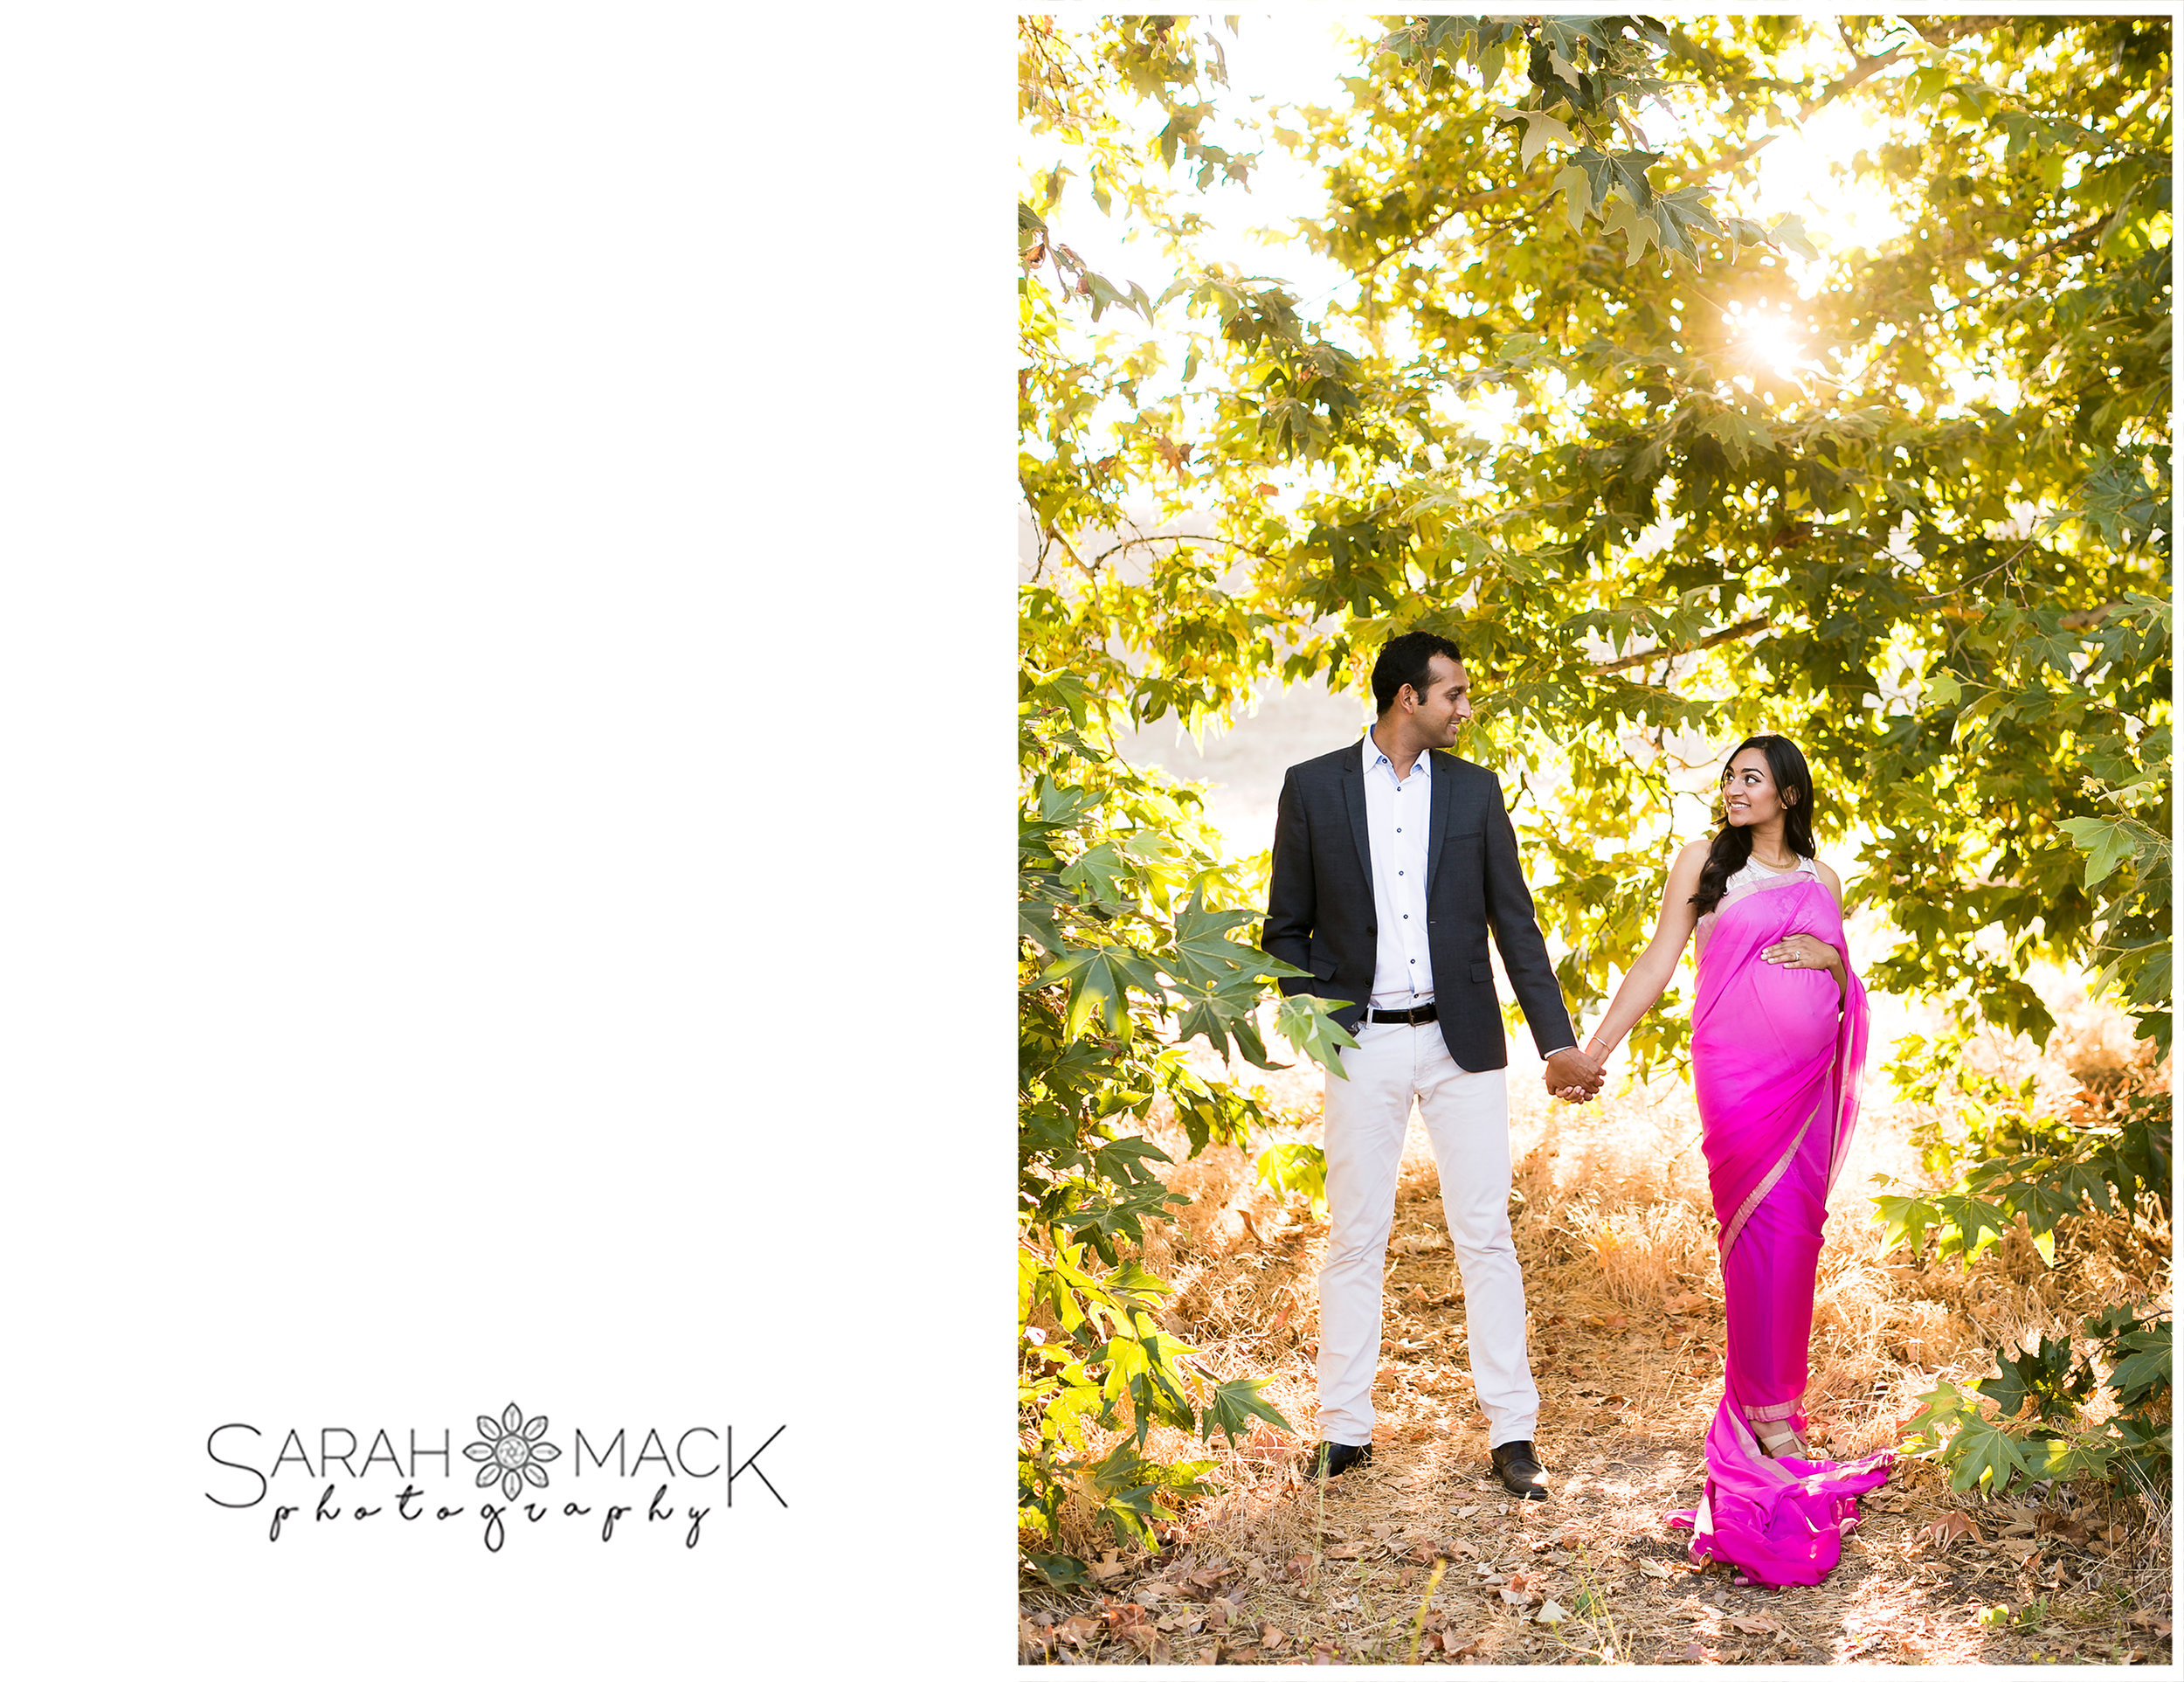 SA-Orange-County-Maternity-Photography-5.jpg